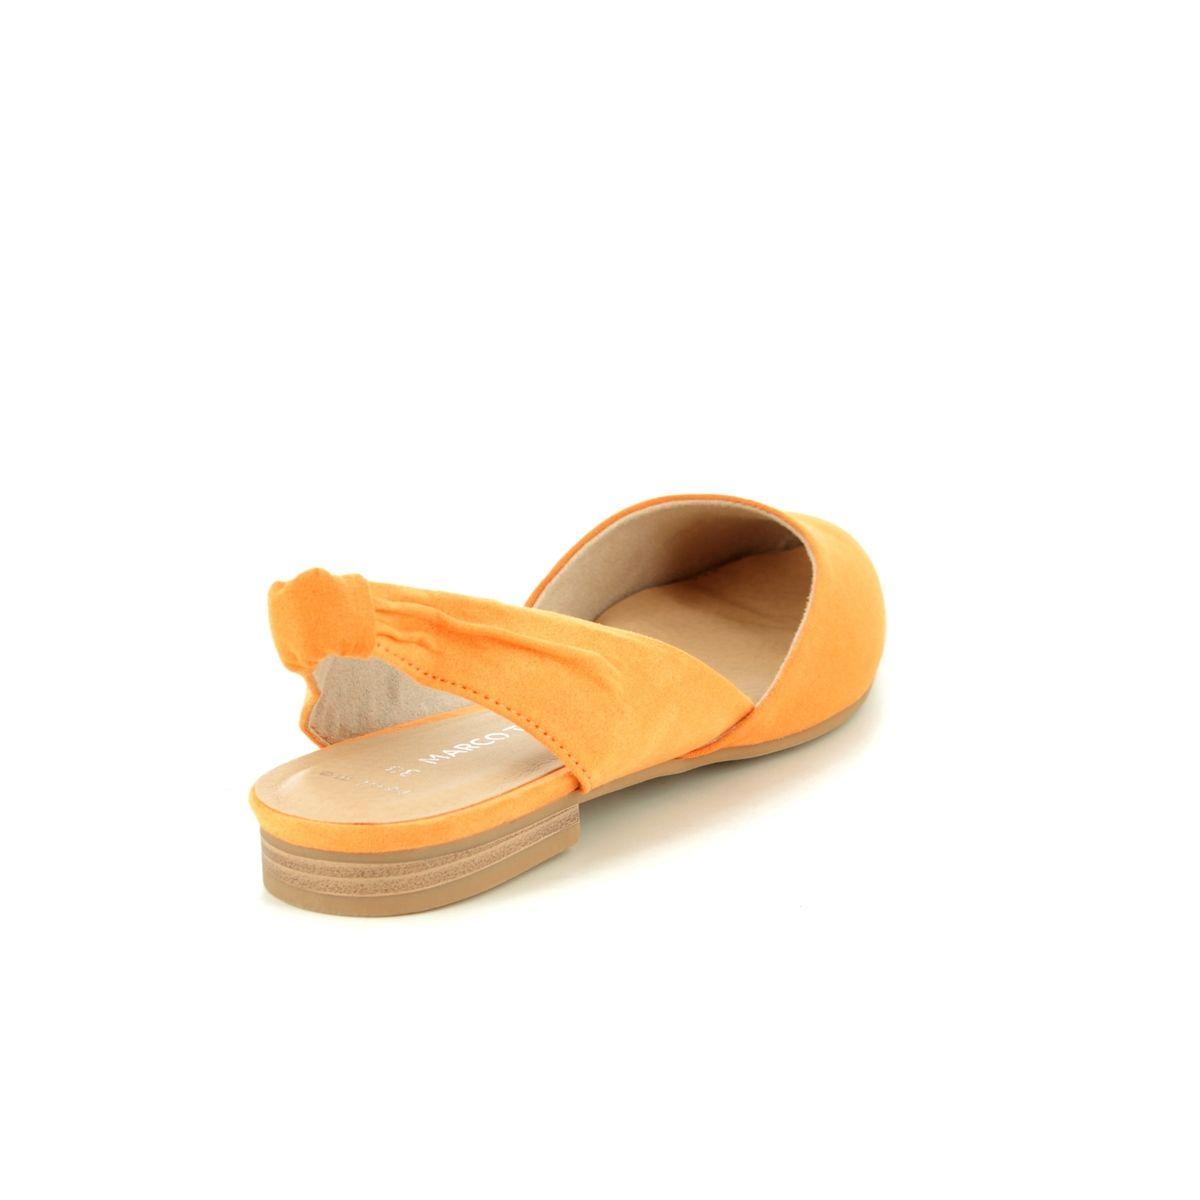 783df349f73a4 Marco Tozzi Closed Toe Sandals - Orange - 29407/32/637 BRAVISLING